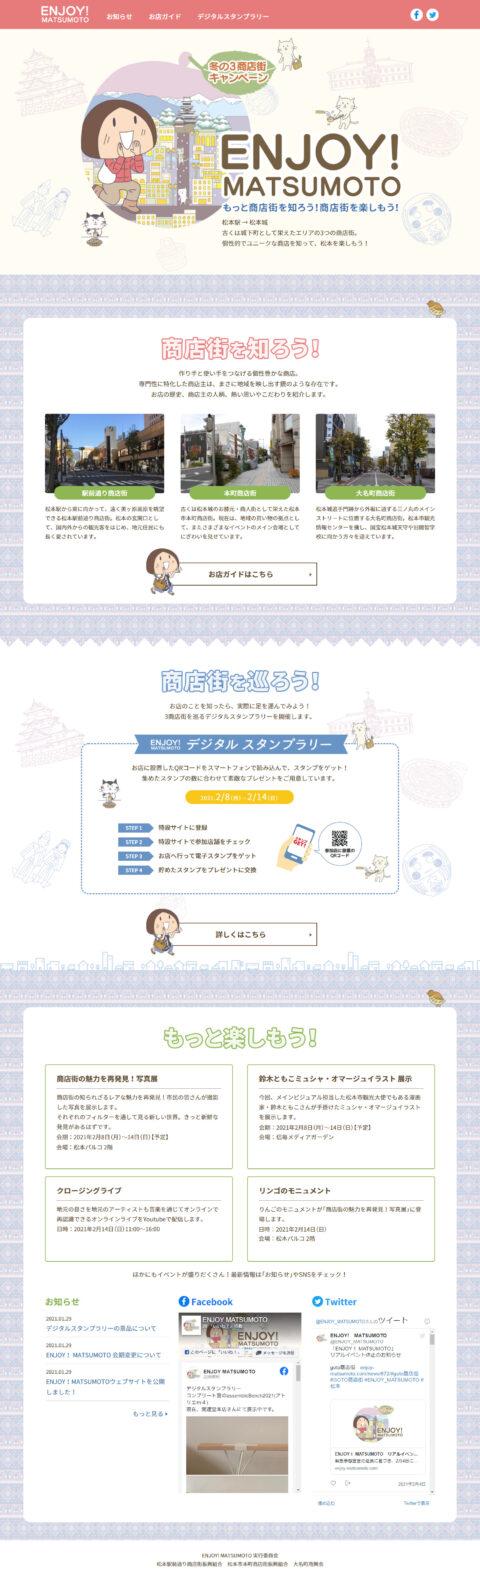 ENJOY!MATSUMOTO 冬の3商店街キャンペーン